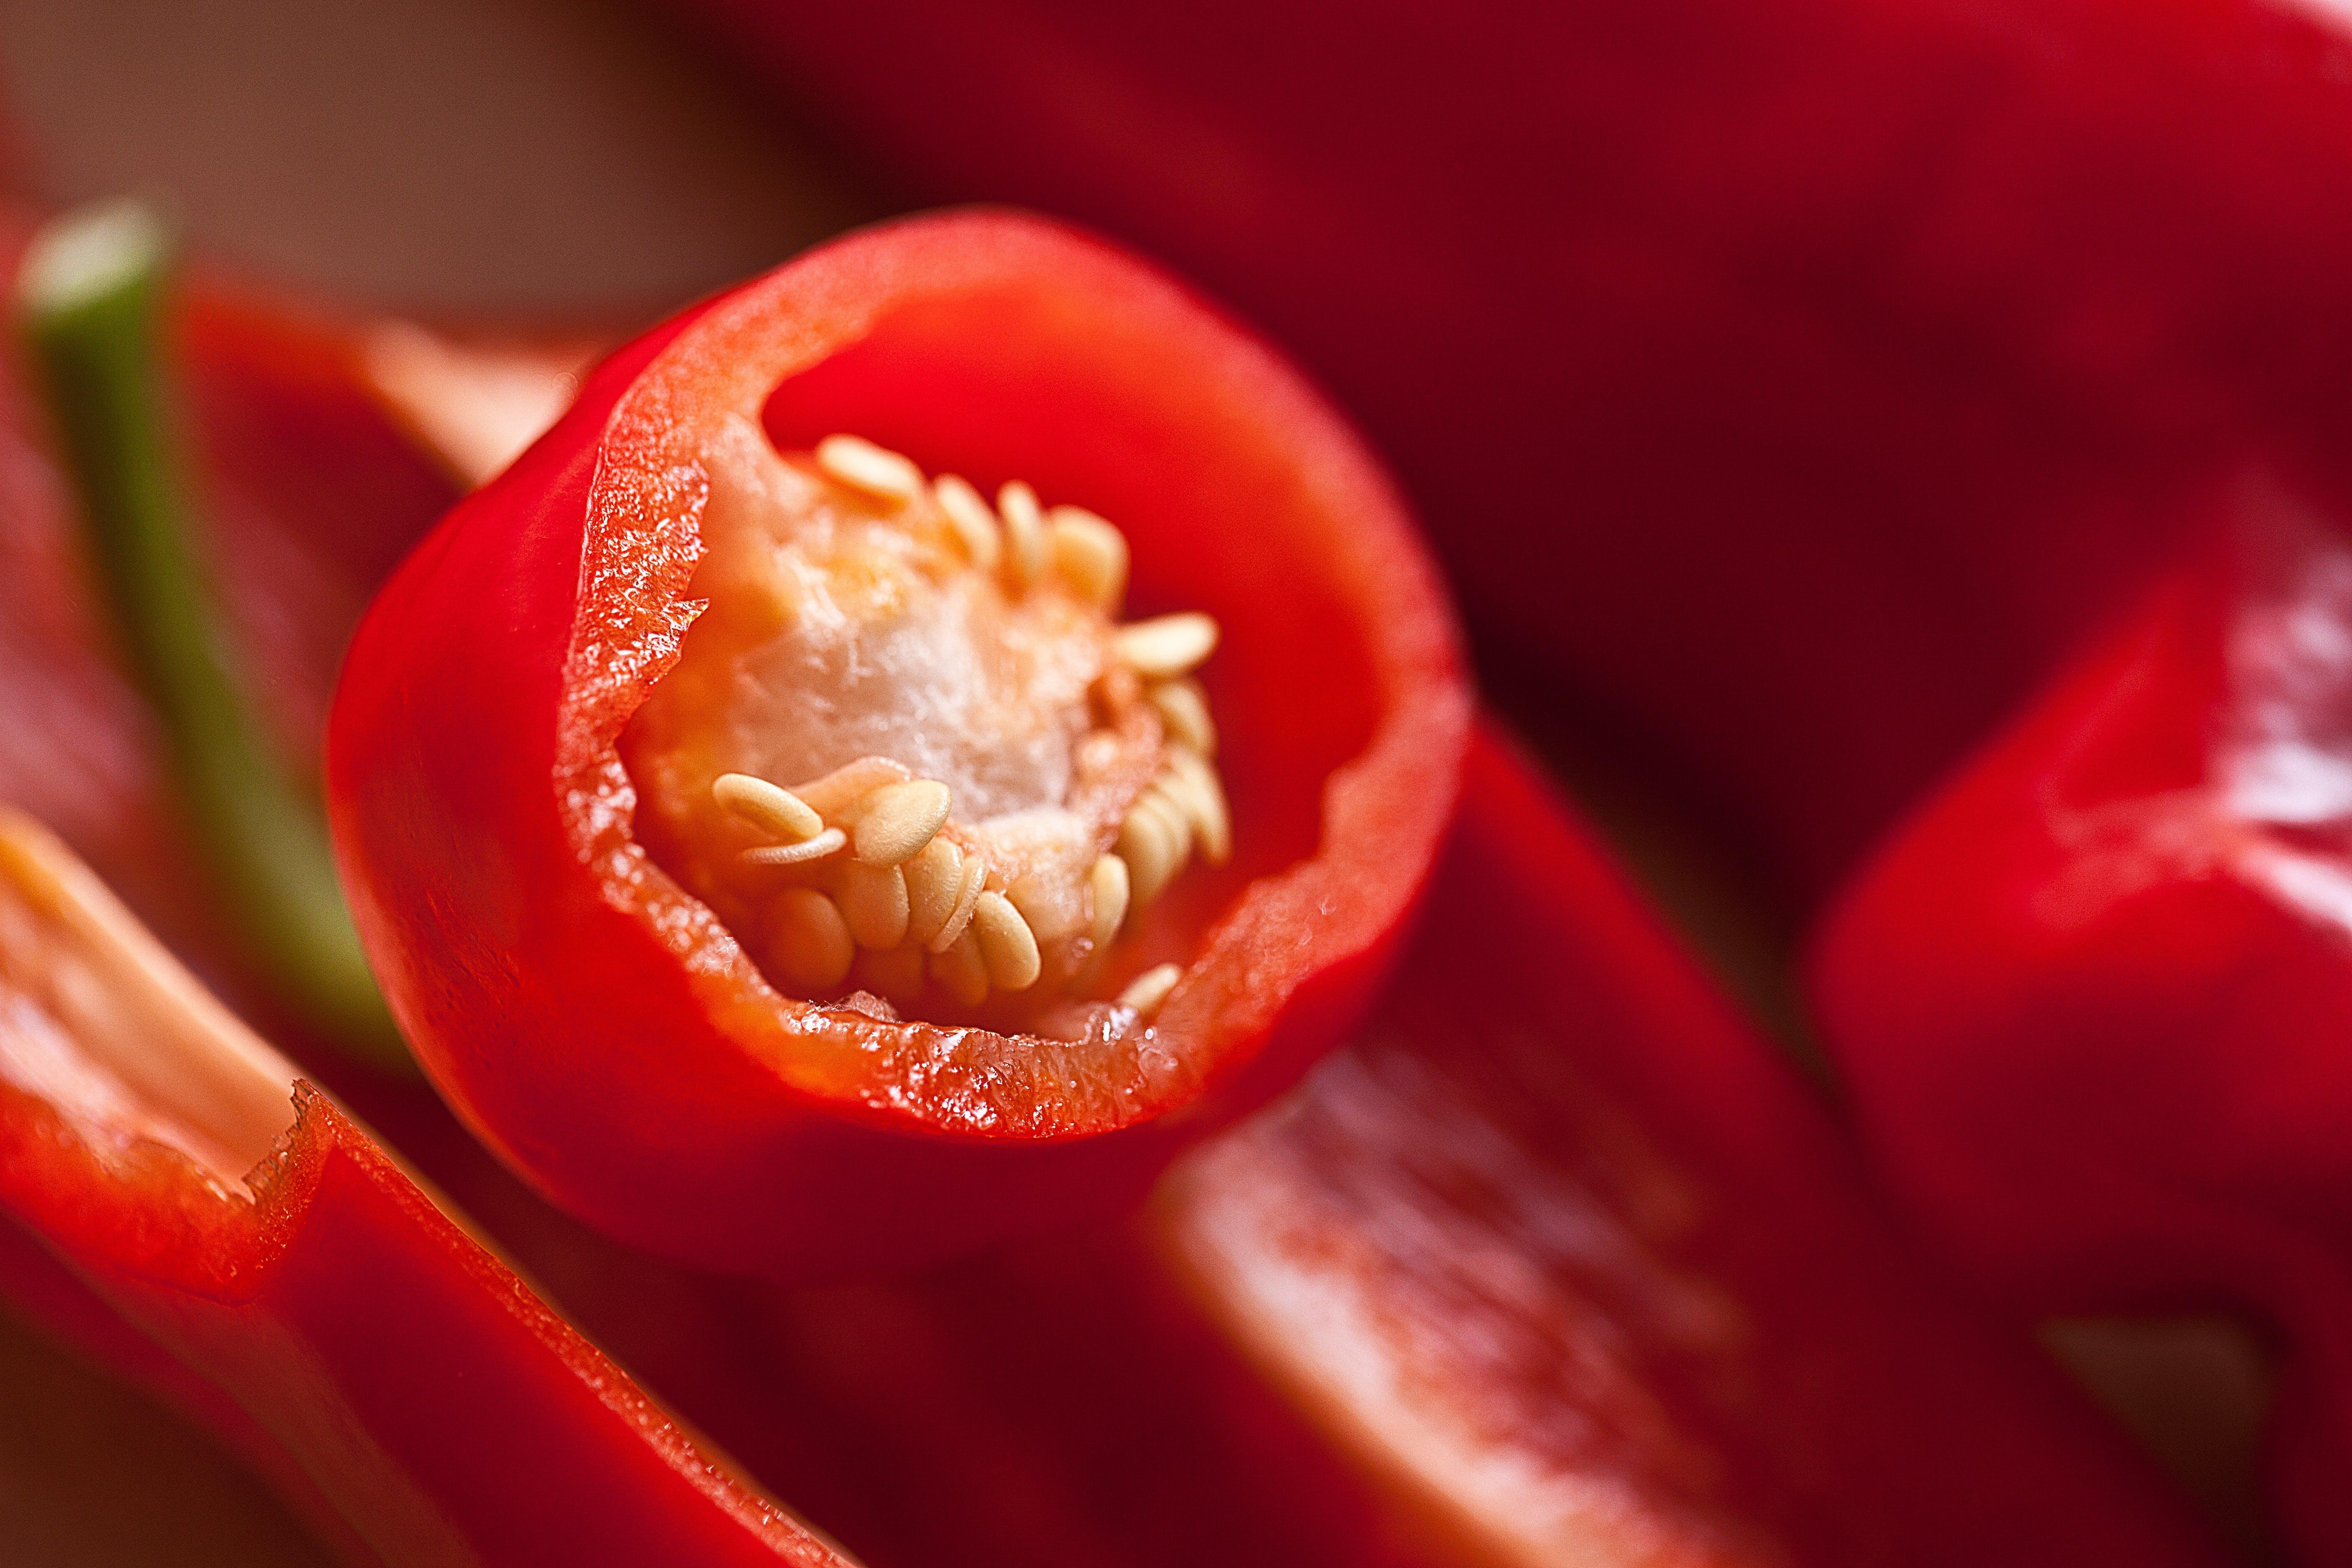 Red Chili Macro Photography